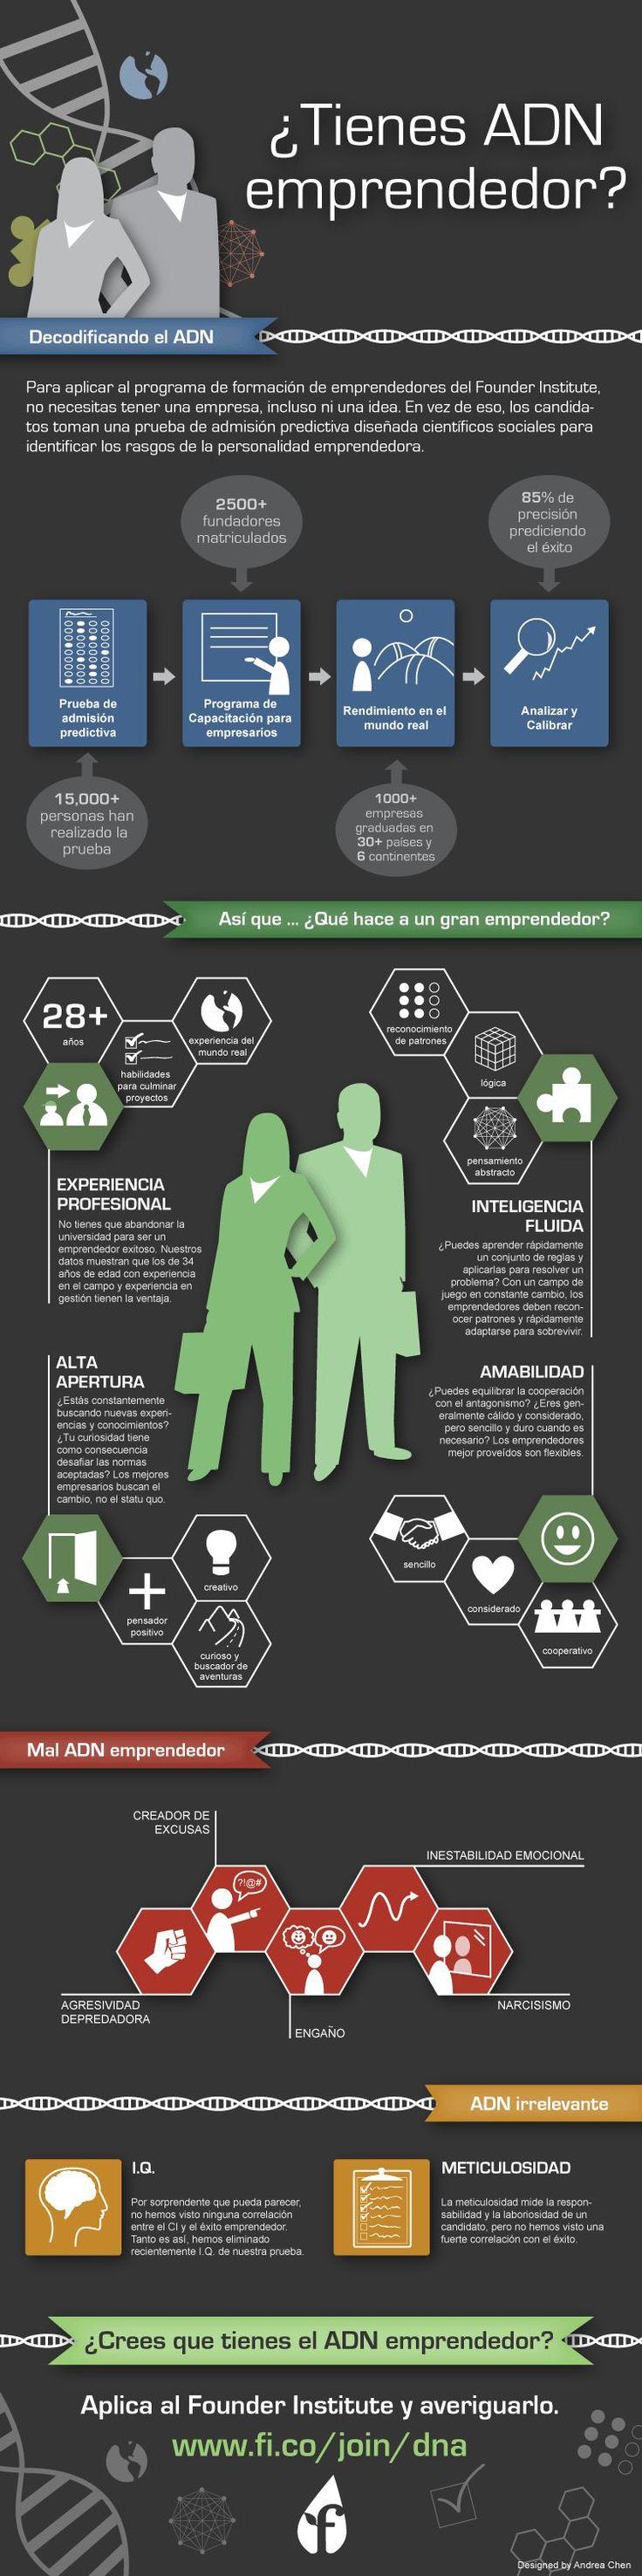 ¿Sabes si tu ADN es emprendedor? Fuente: www.fi.co/join/dna #infografia #infographic #entrepreneurship